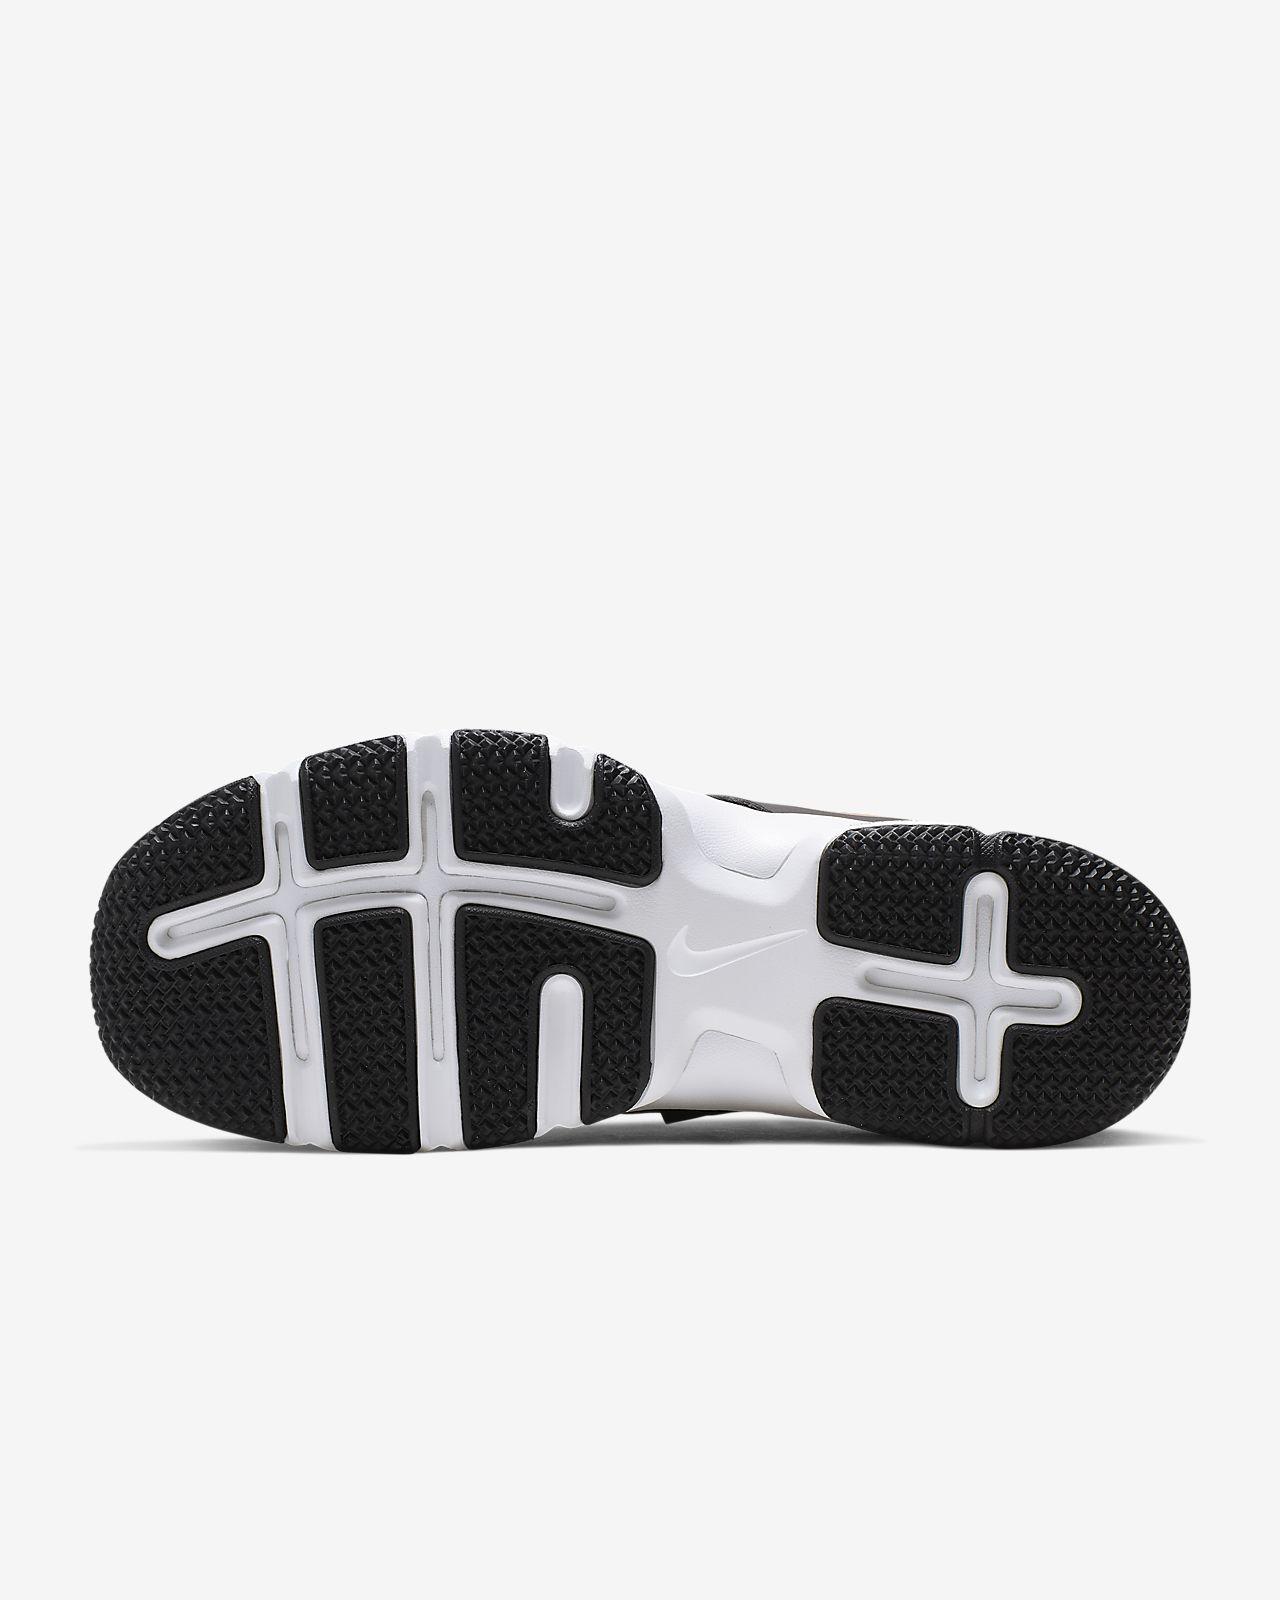 the latest 5e70c acf8a ... Nike Lunar Fingertrap TR Men s Gym Gameday Shoe